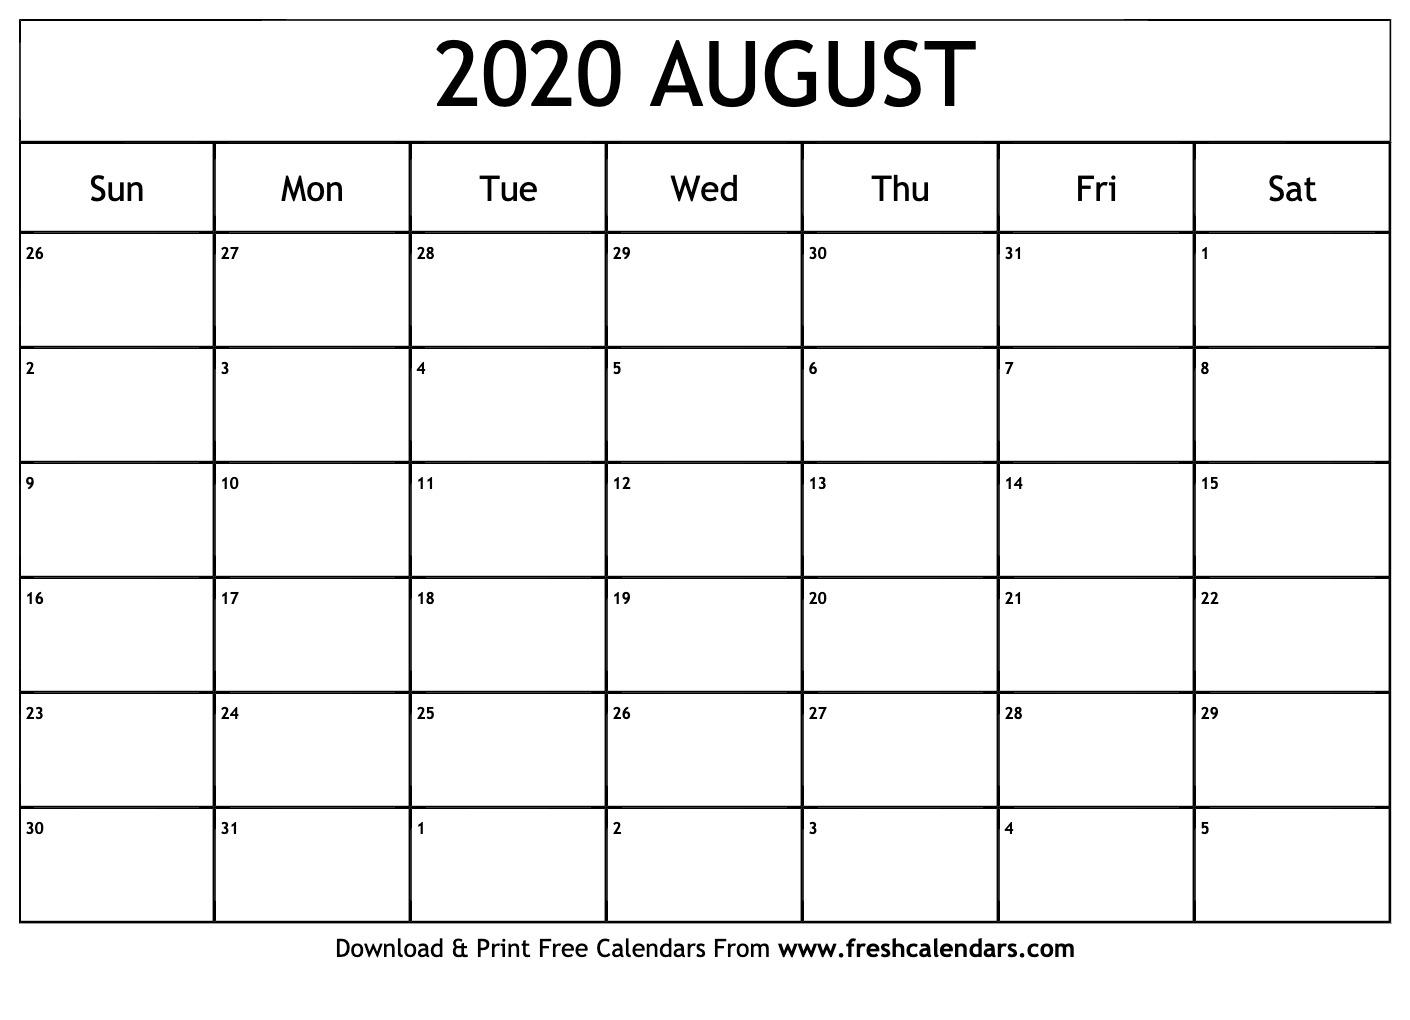 Blank Calendar August 2020.August 2020 Calendar Printable Fresh Calendars